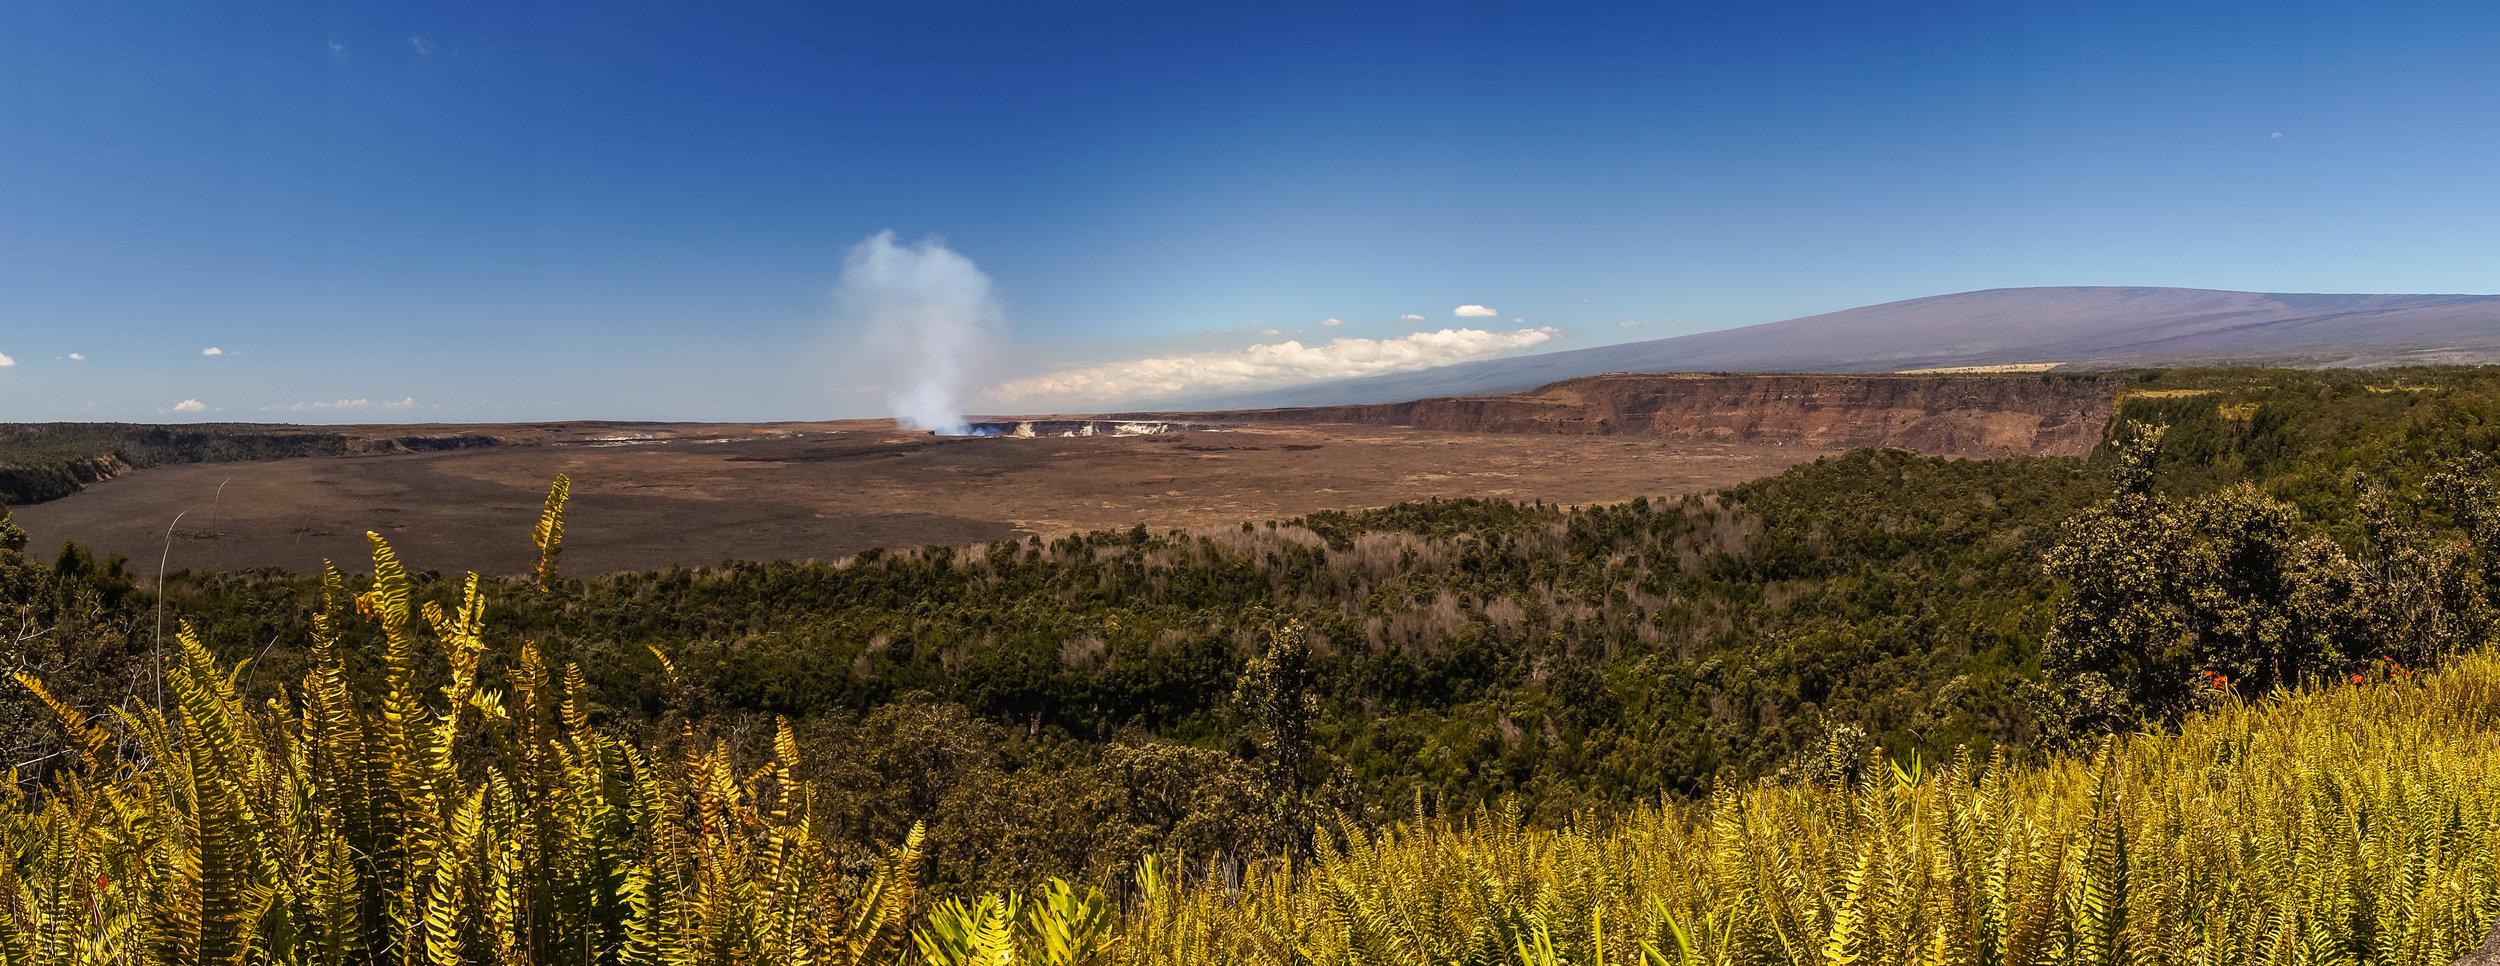 Volcanoes National Park, Hawai'i - Photo: Zygmunt Spray